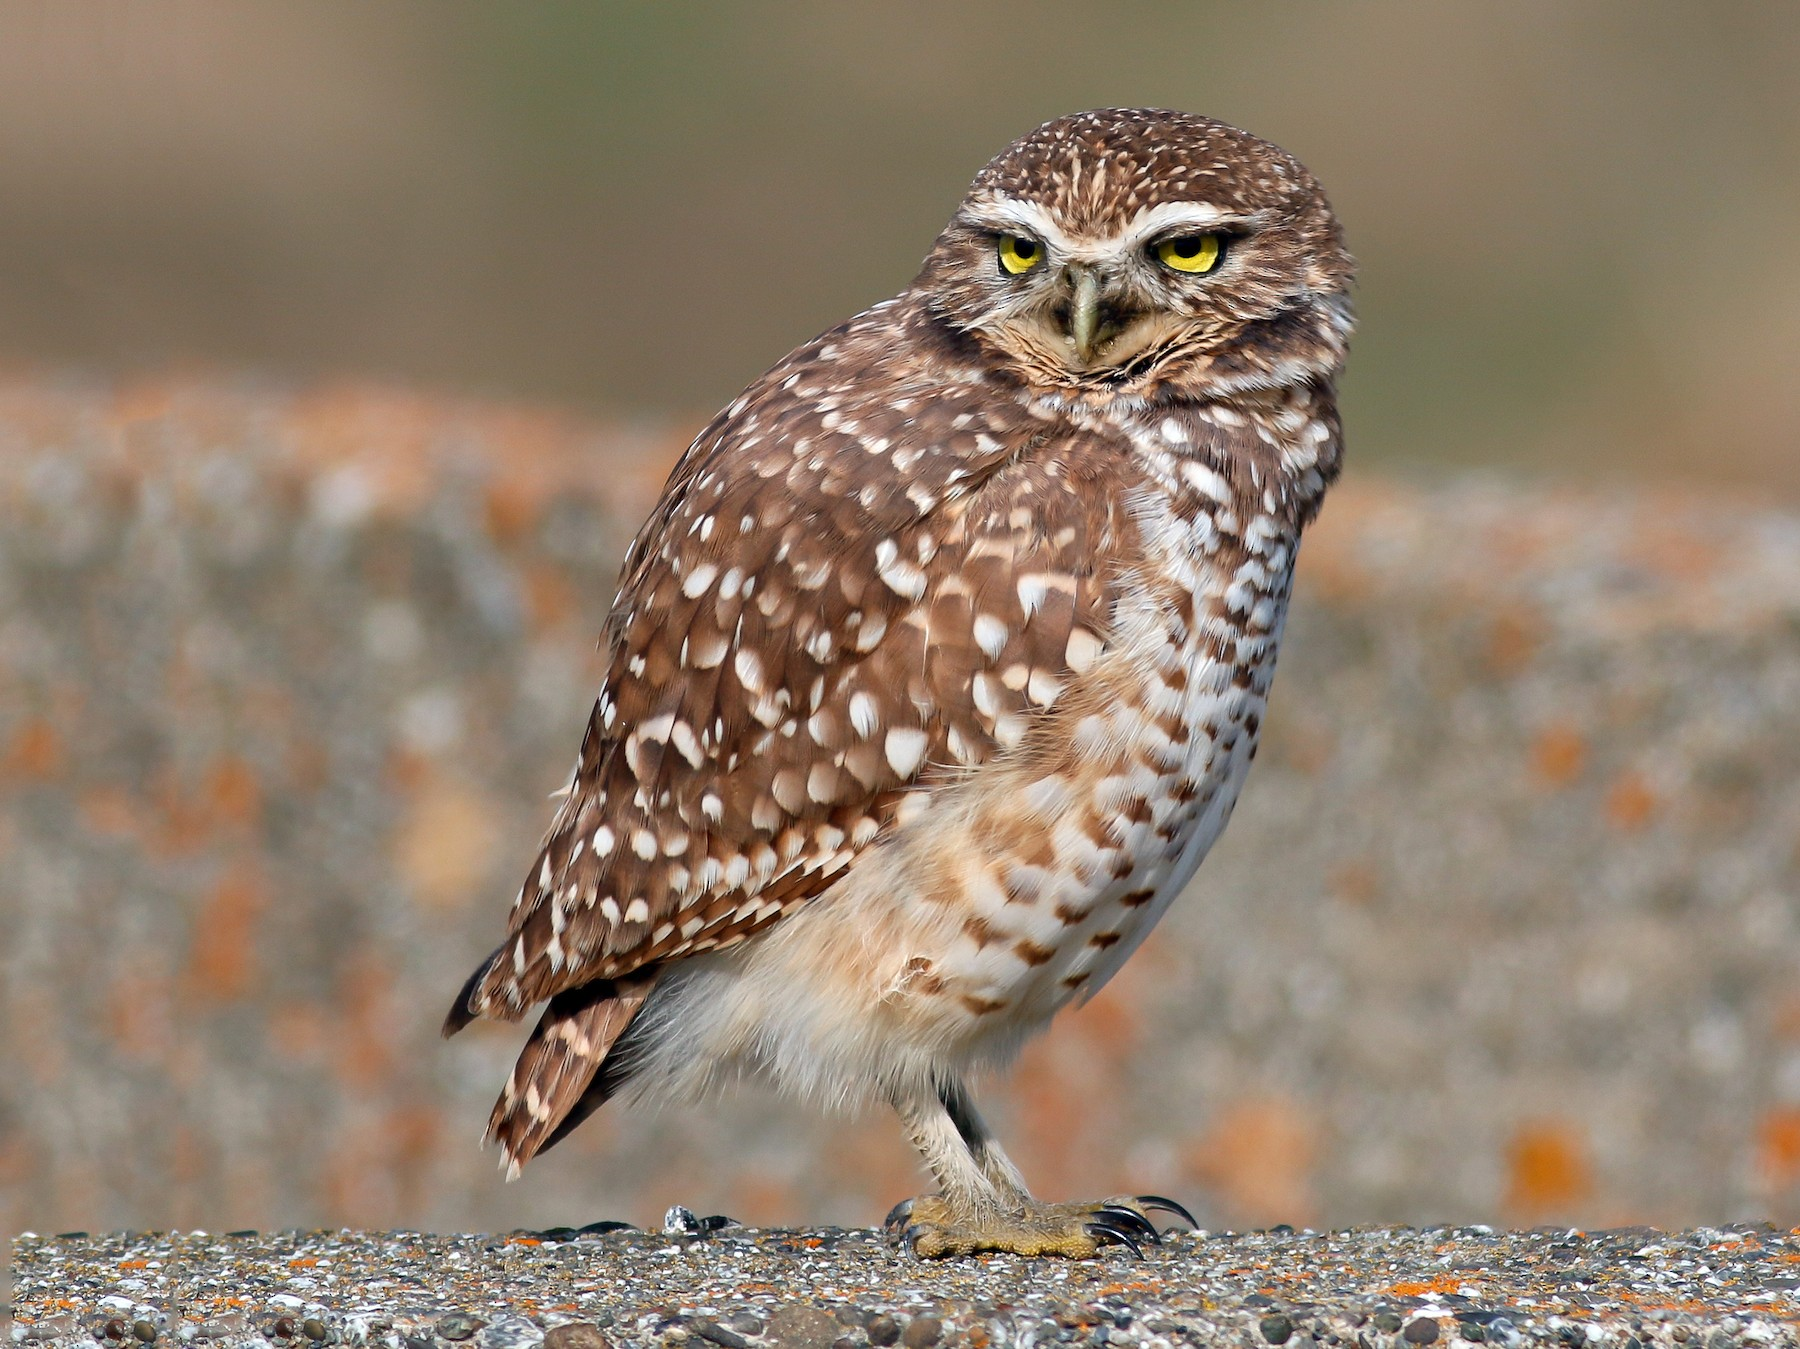 Burrowing Owl - Kirk Swenson